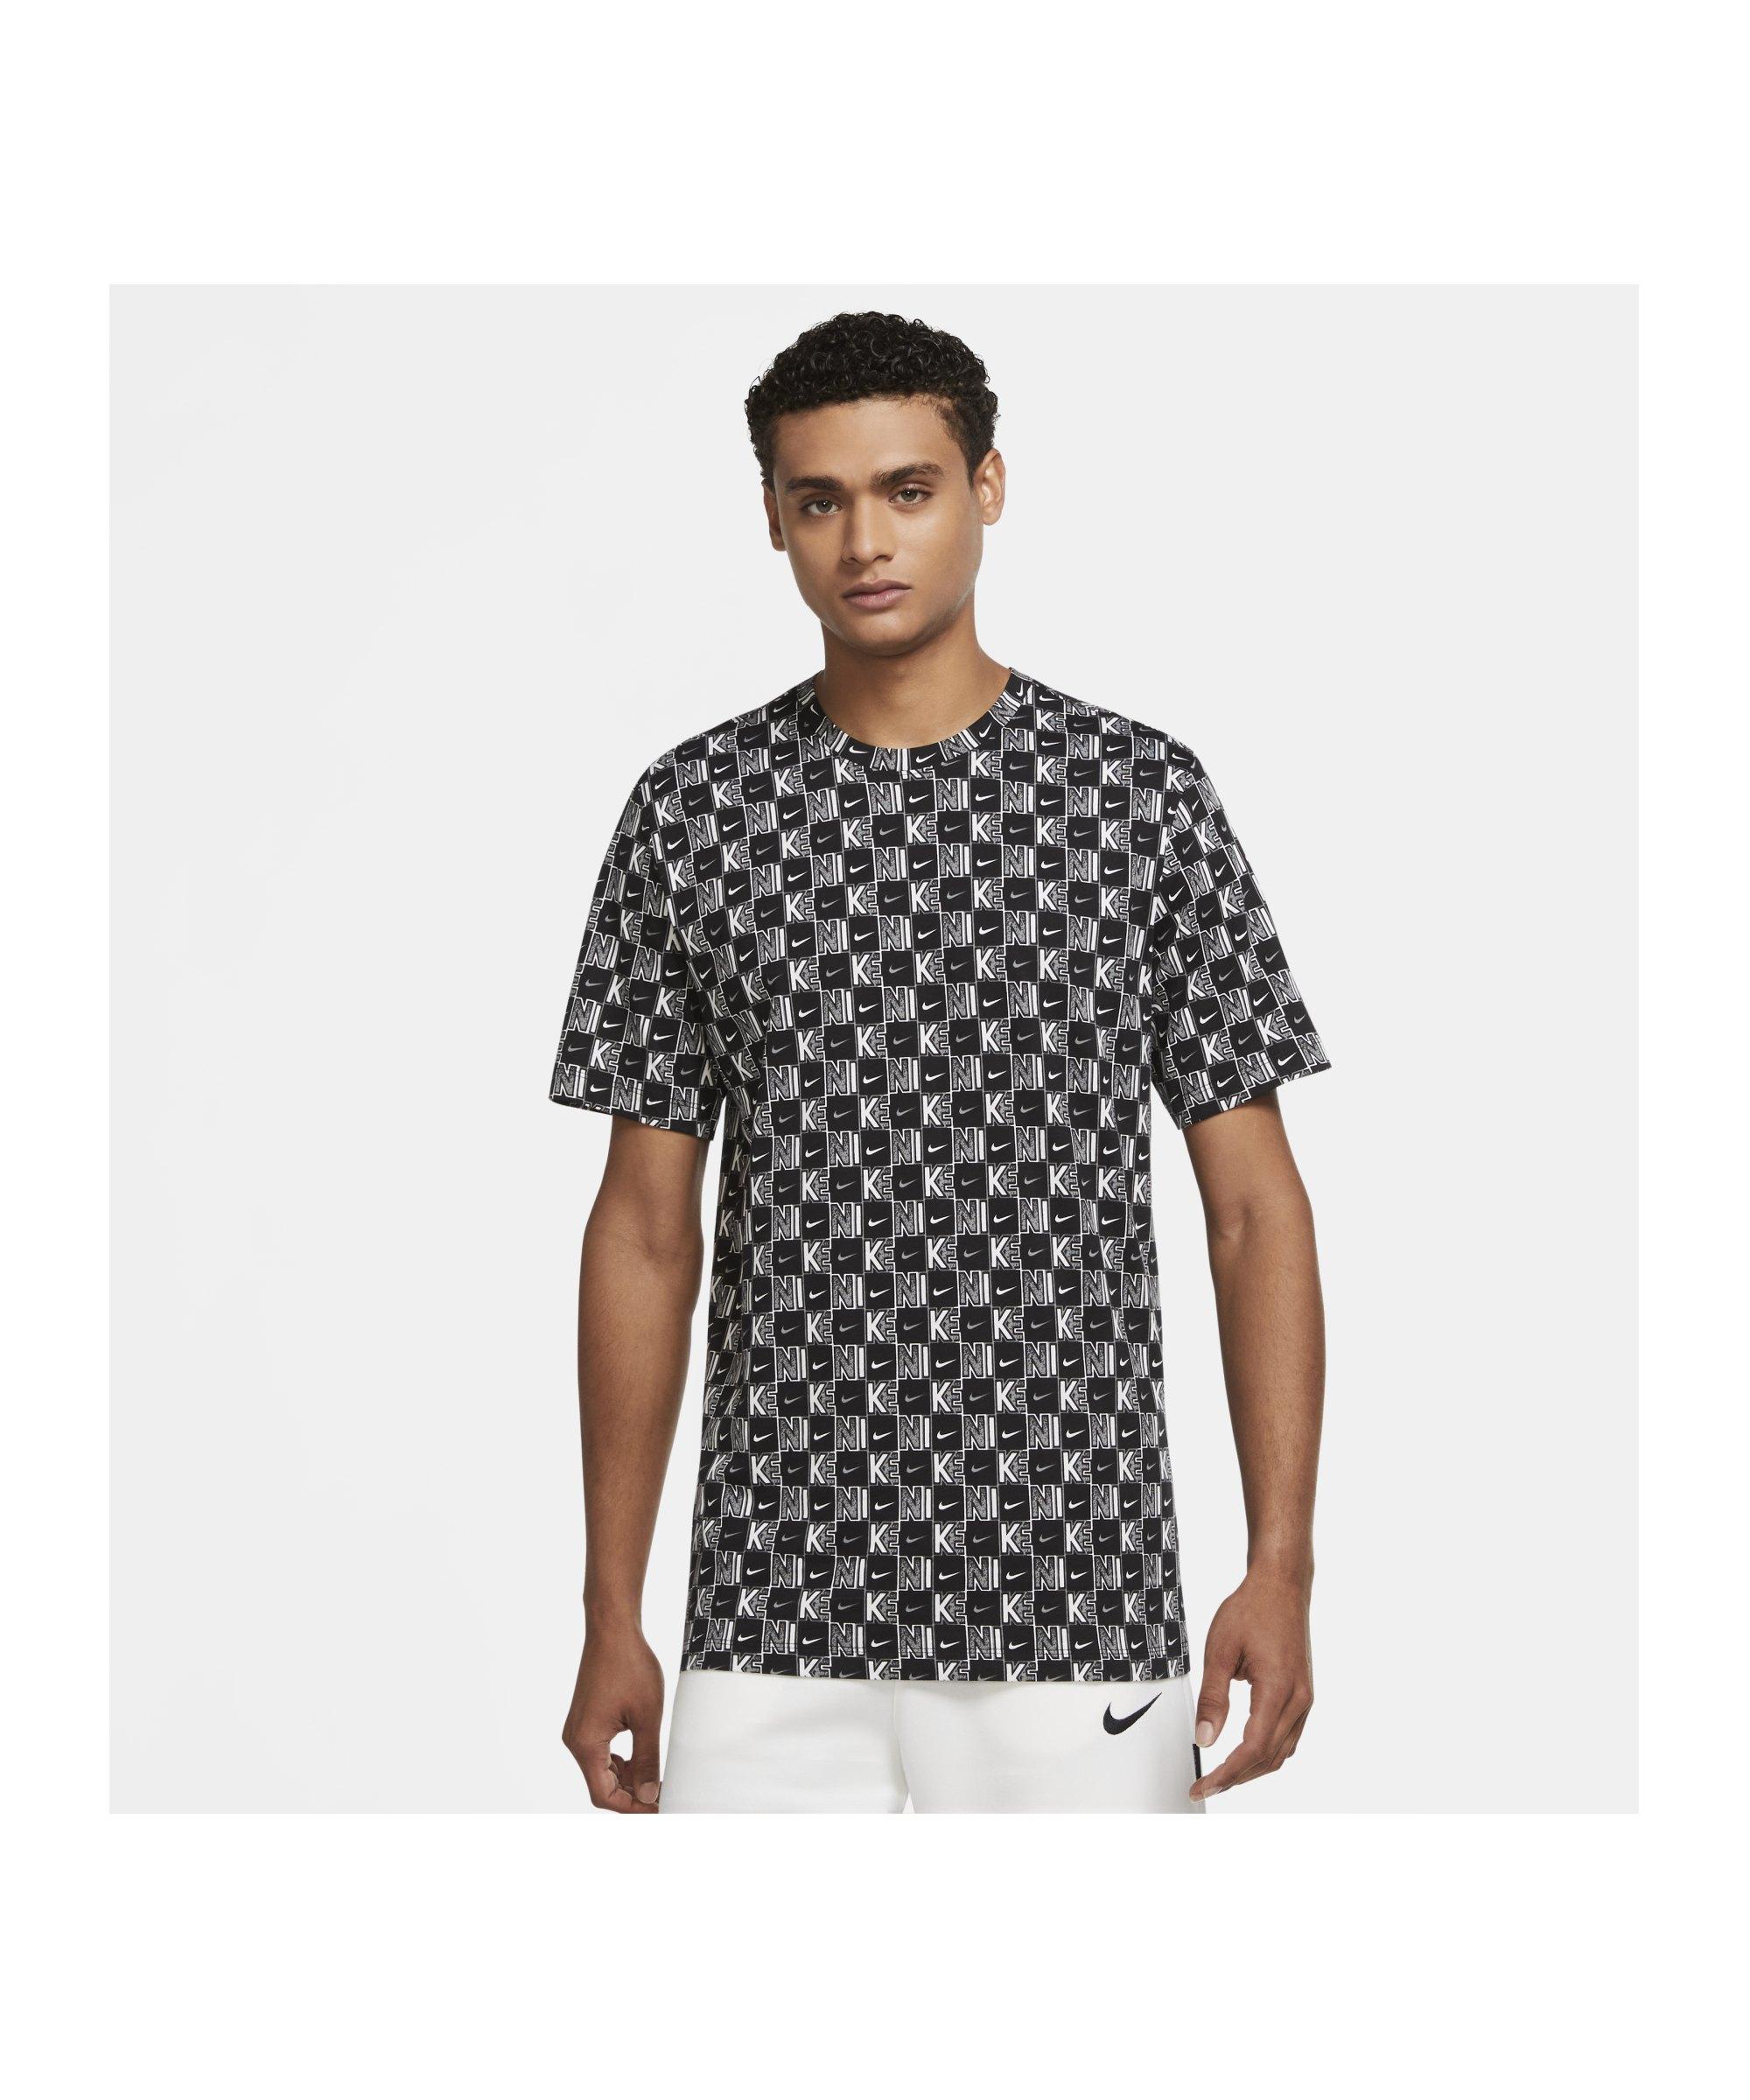 Nike Sportswear Karo T-Shirt Weiss Schwarz F100 - weiss